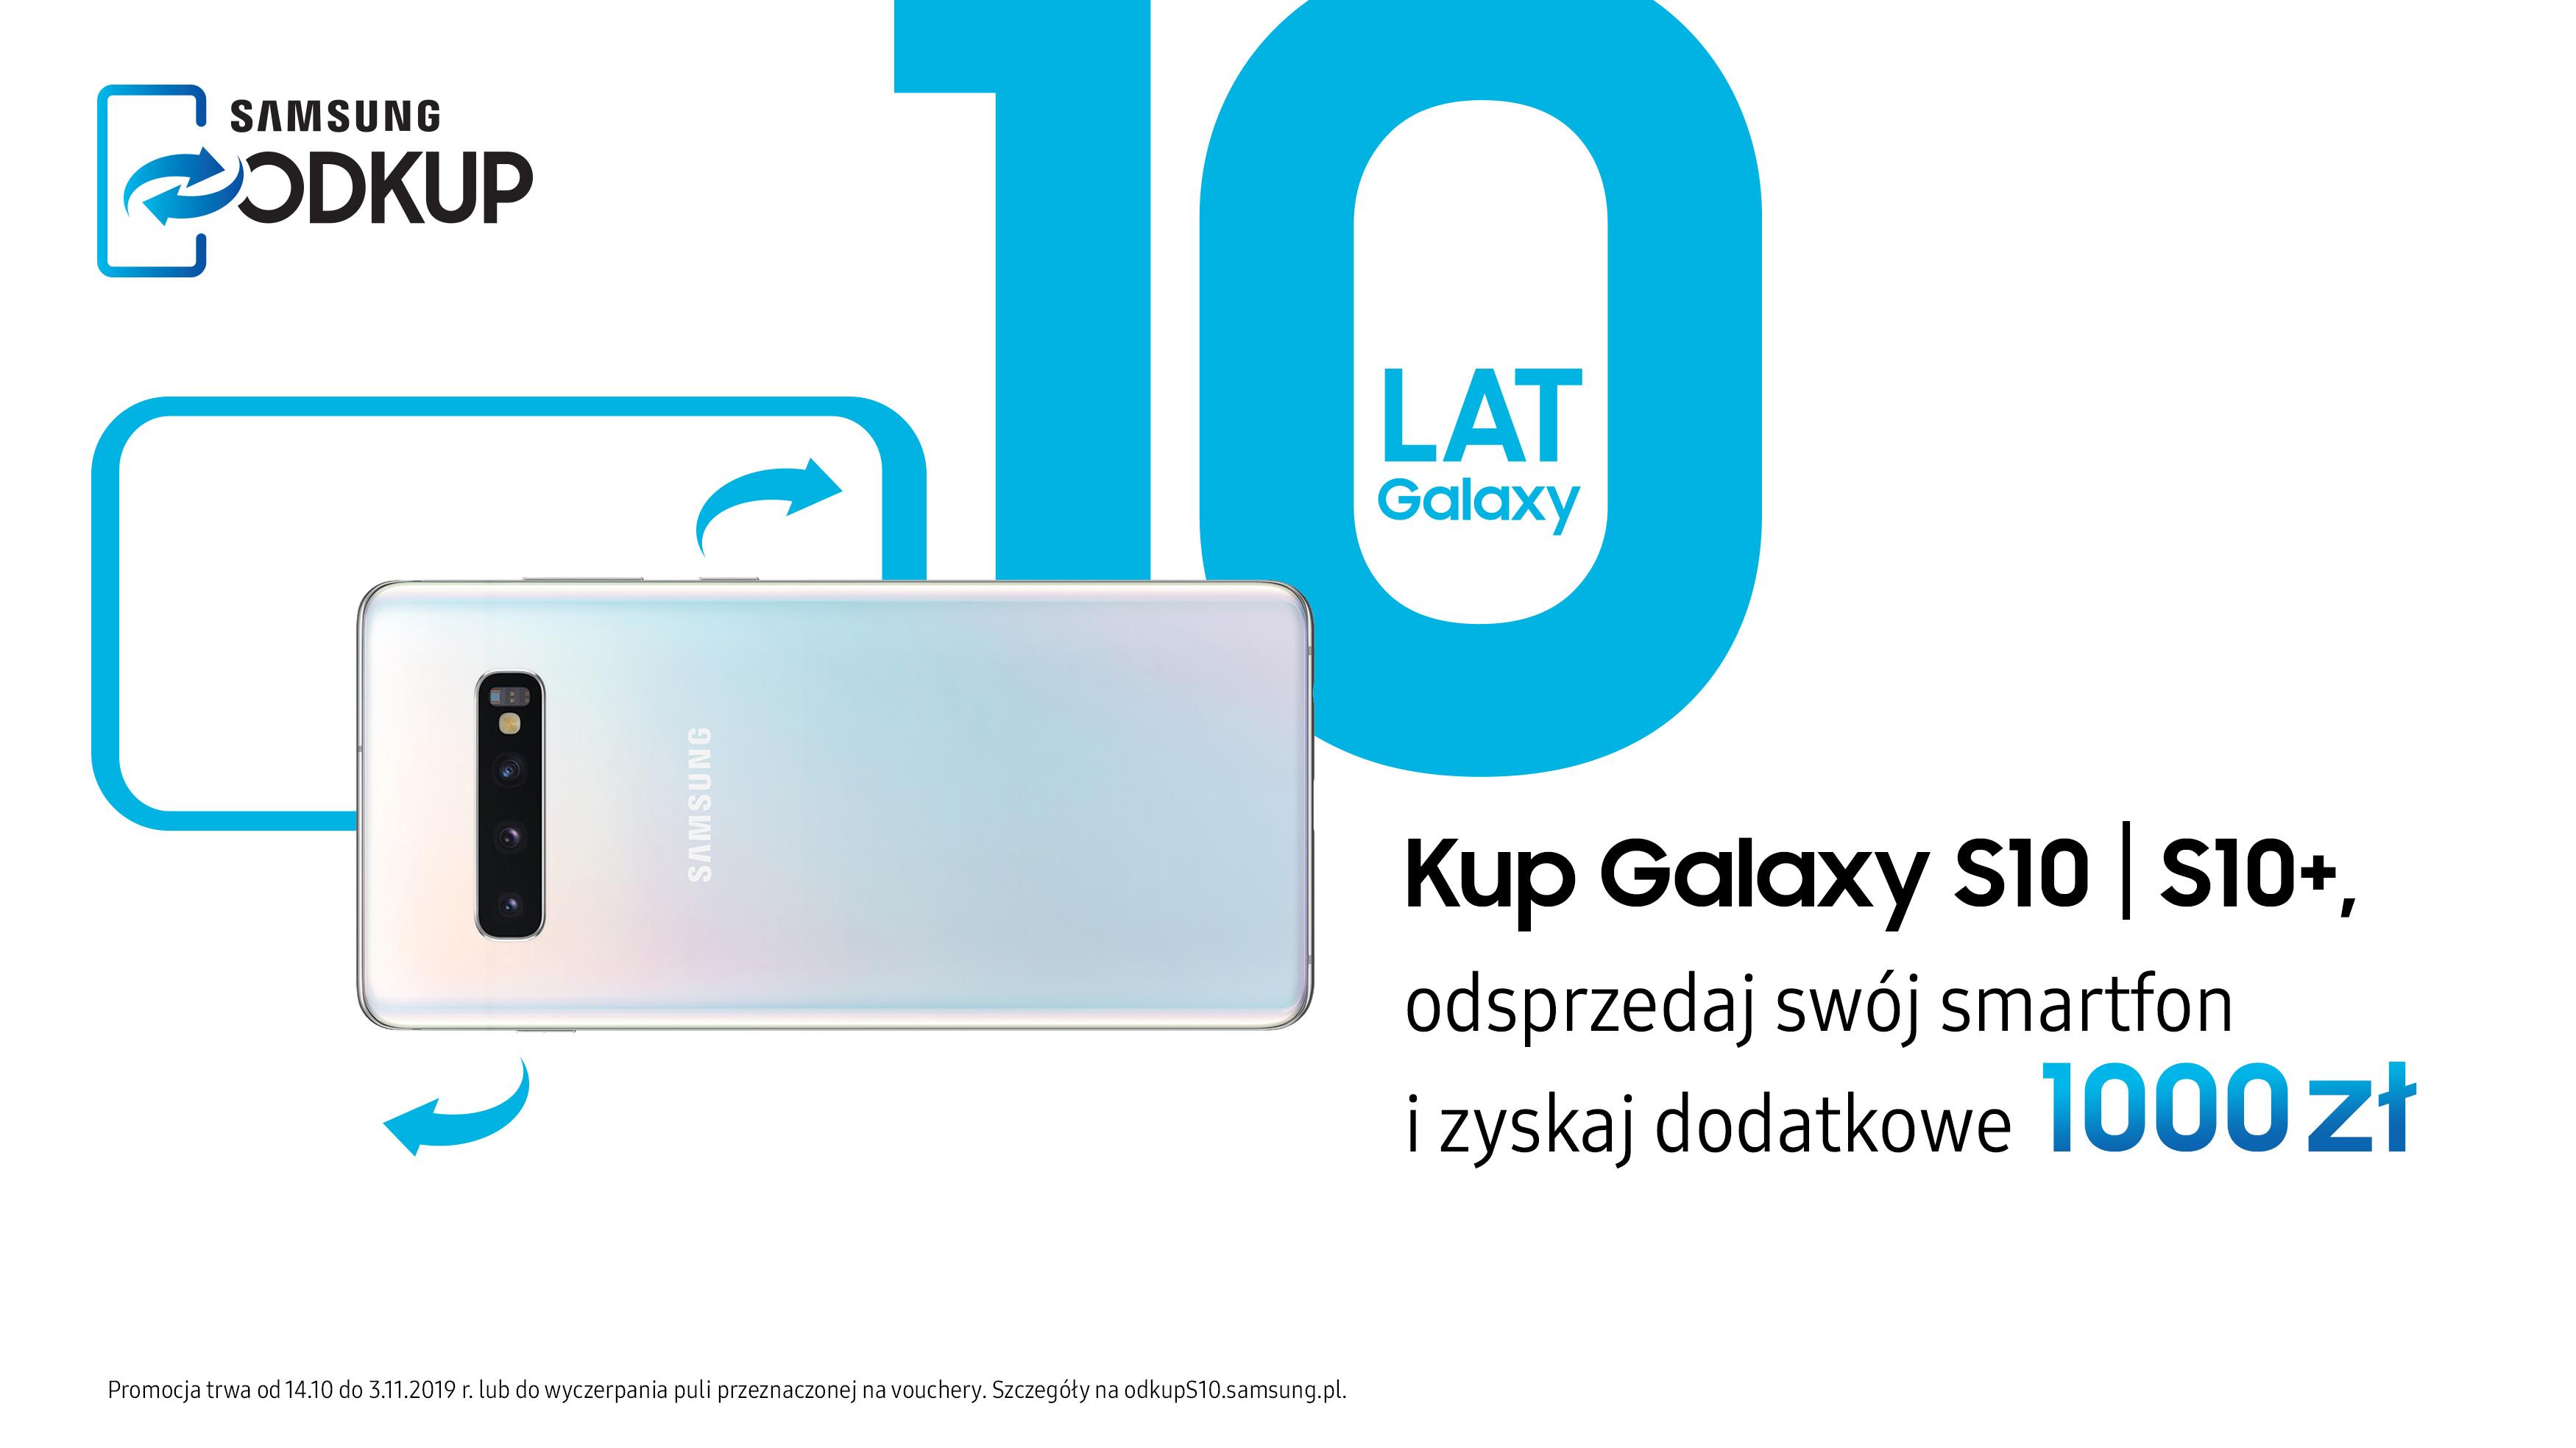 Kup Samsung Galaxy S10